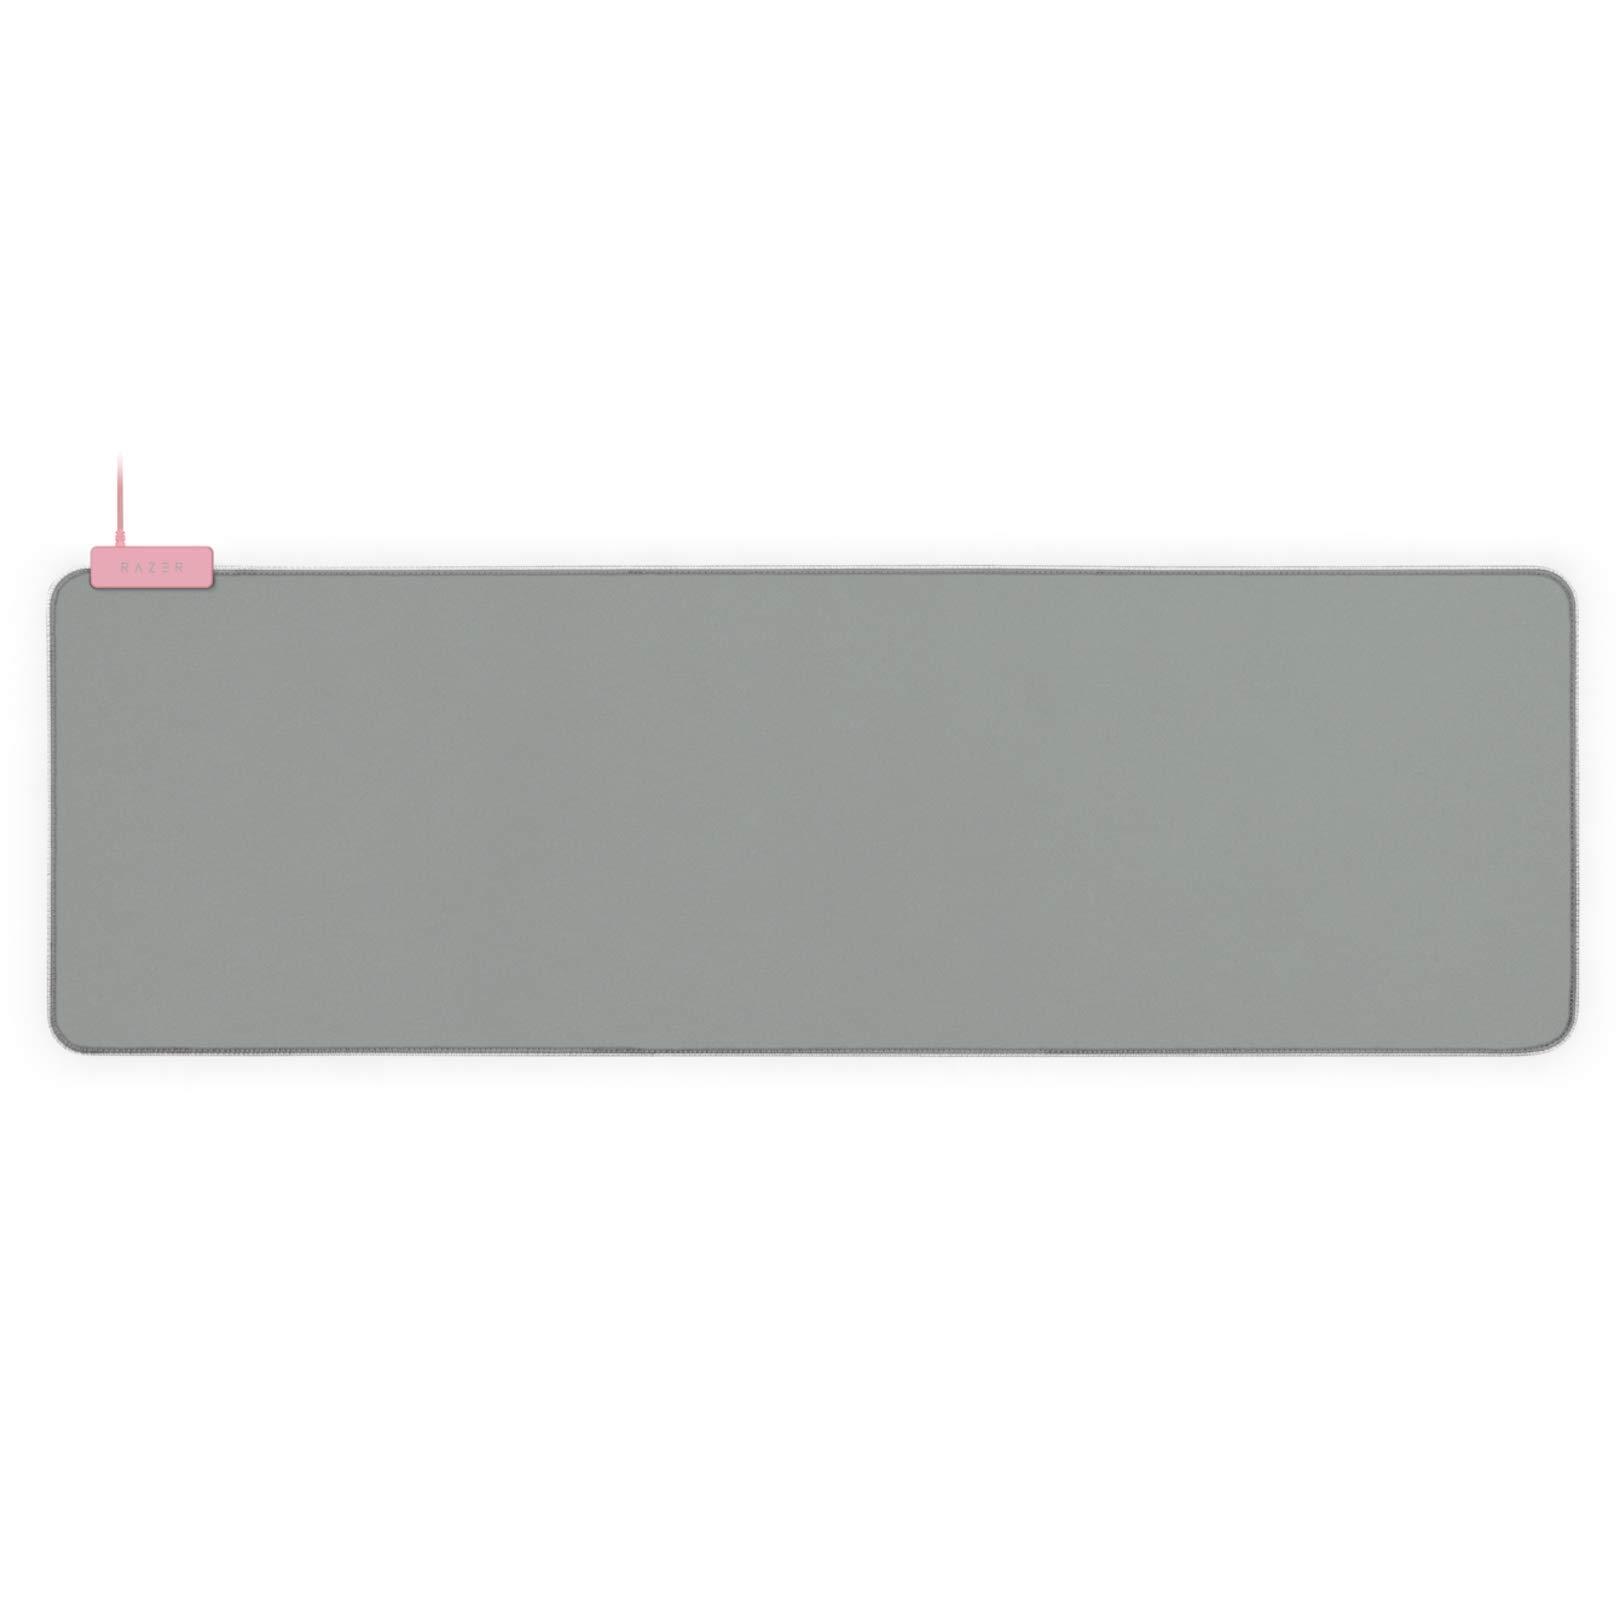 Razer Goliathus Extended Chroma Gaming Mouse Pad: Customizable Chroma RGB Lighting - Soft, Cloth Material - Balanced Control & Speed - Non-Slip Rubber Base - Quartz Pink